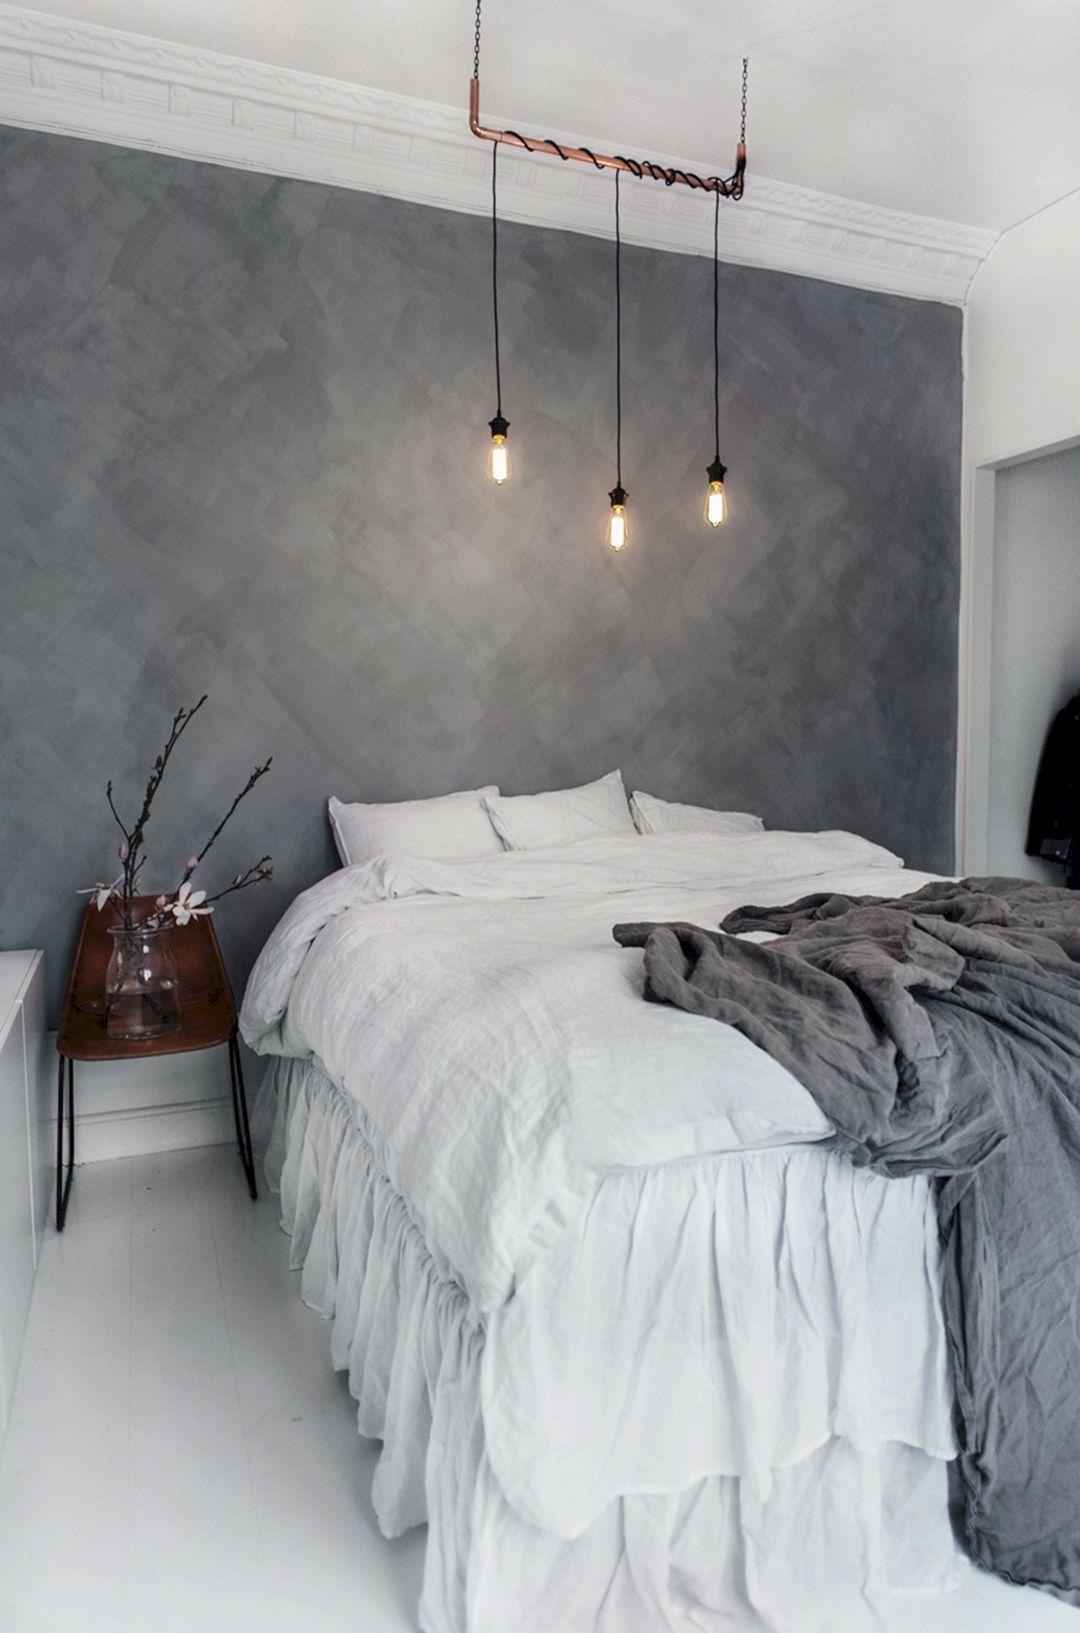 Marmorato cinza no quarto branco